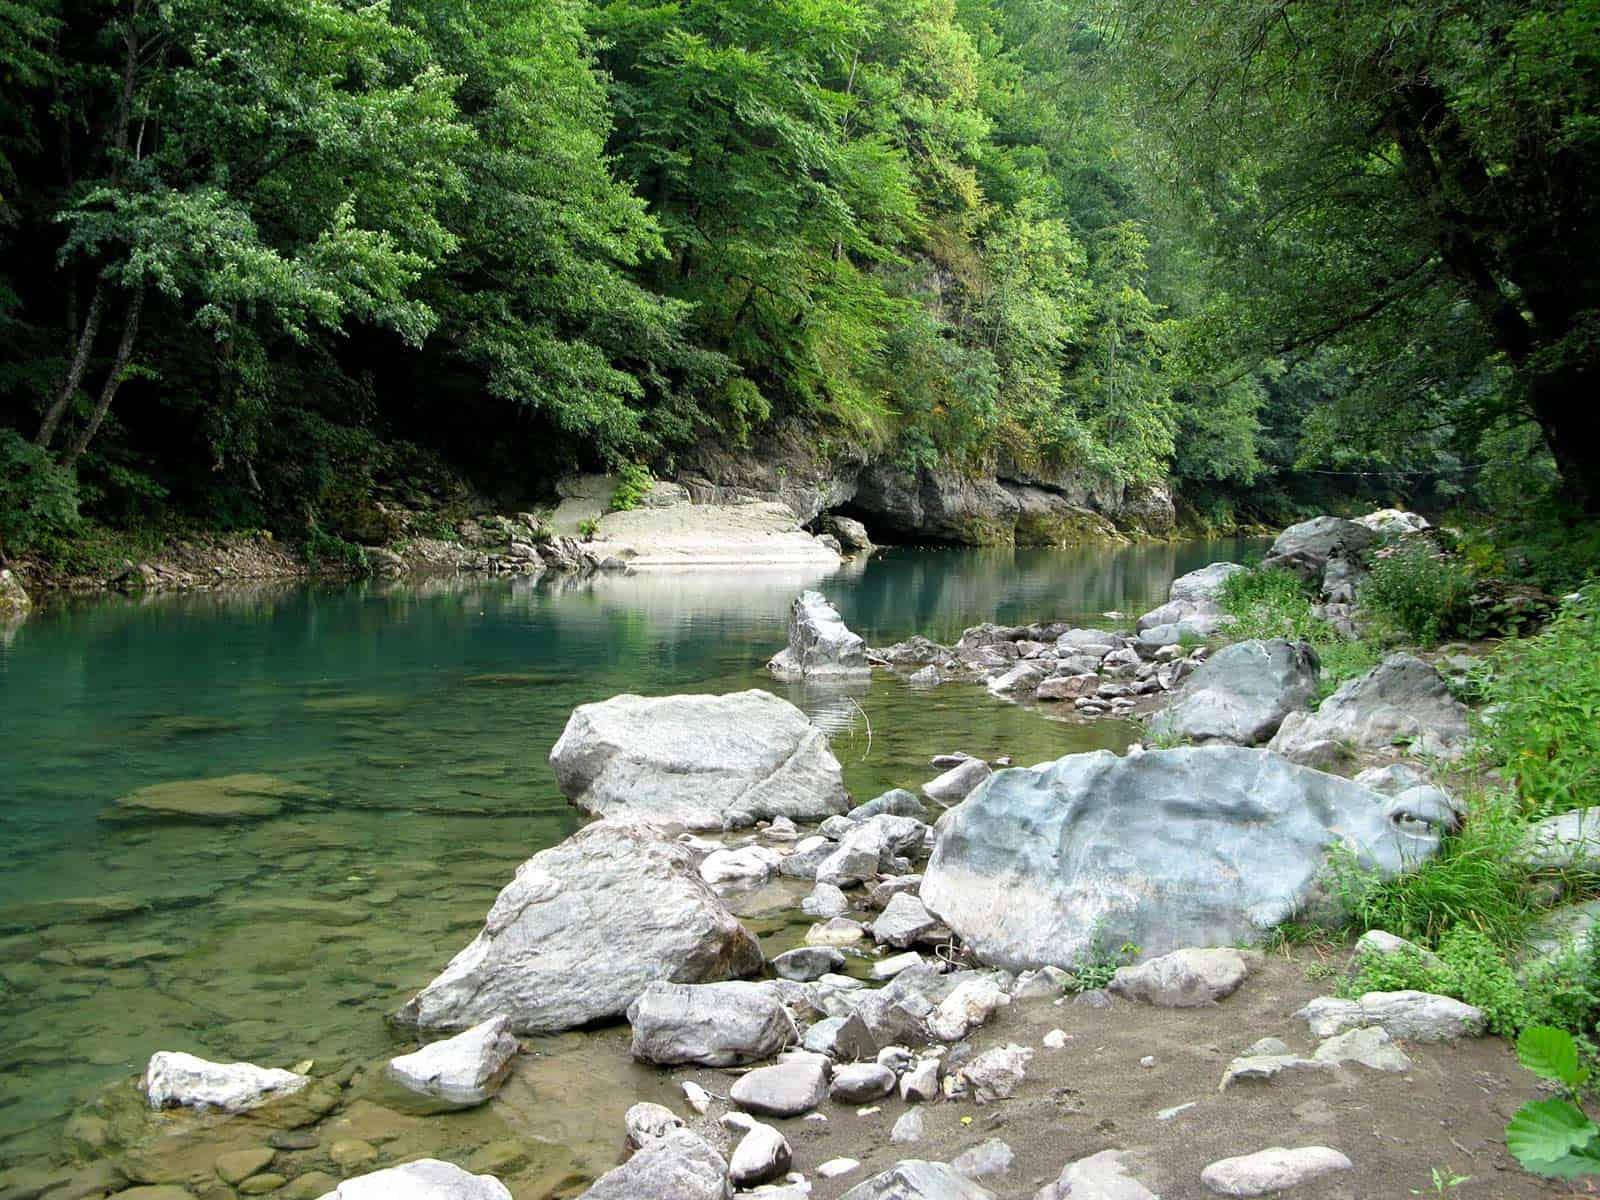 Beautiful view of the tara river